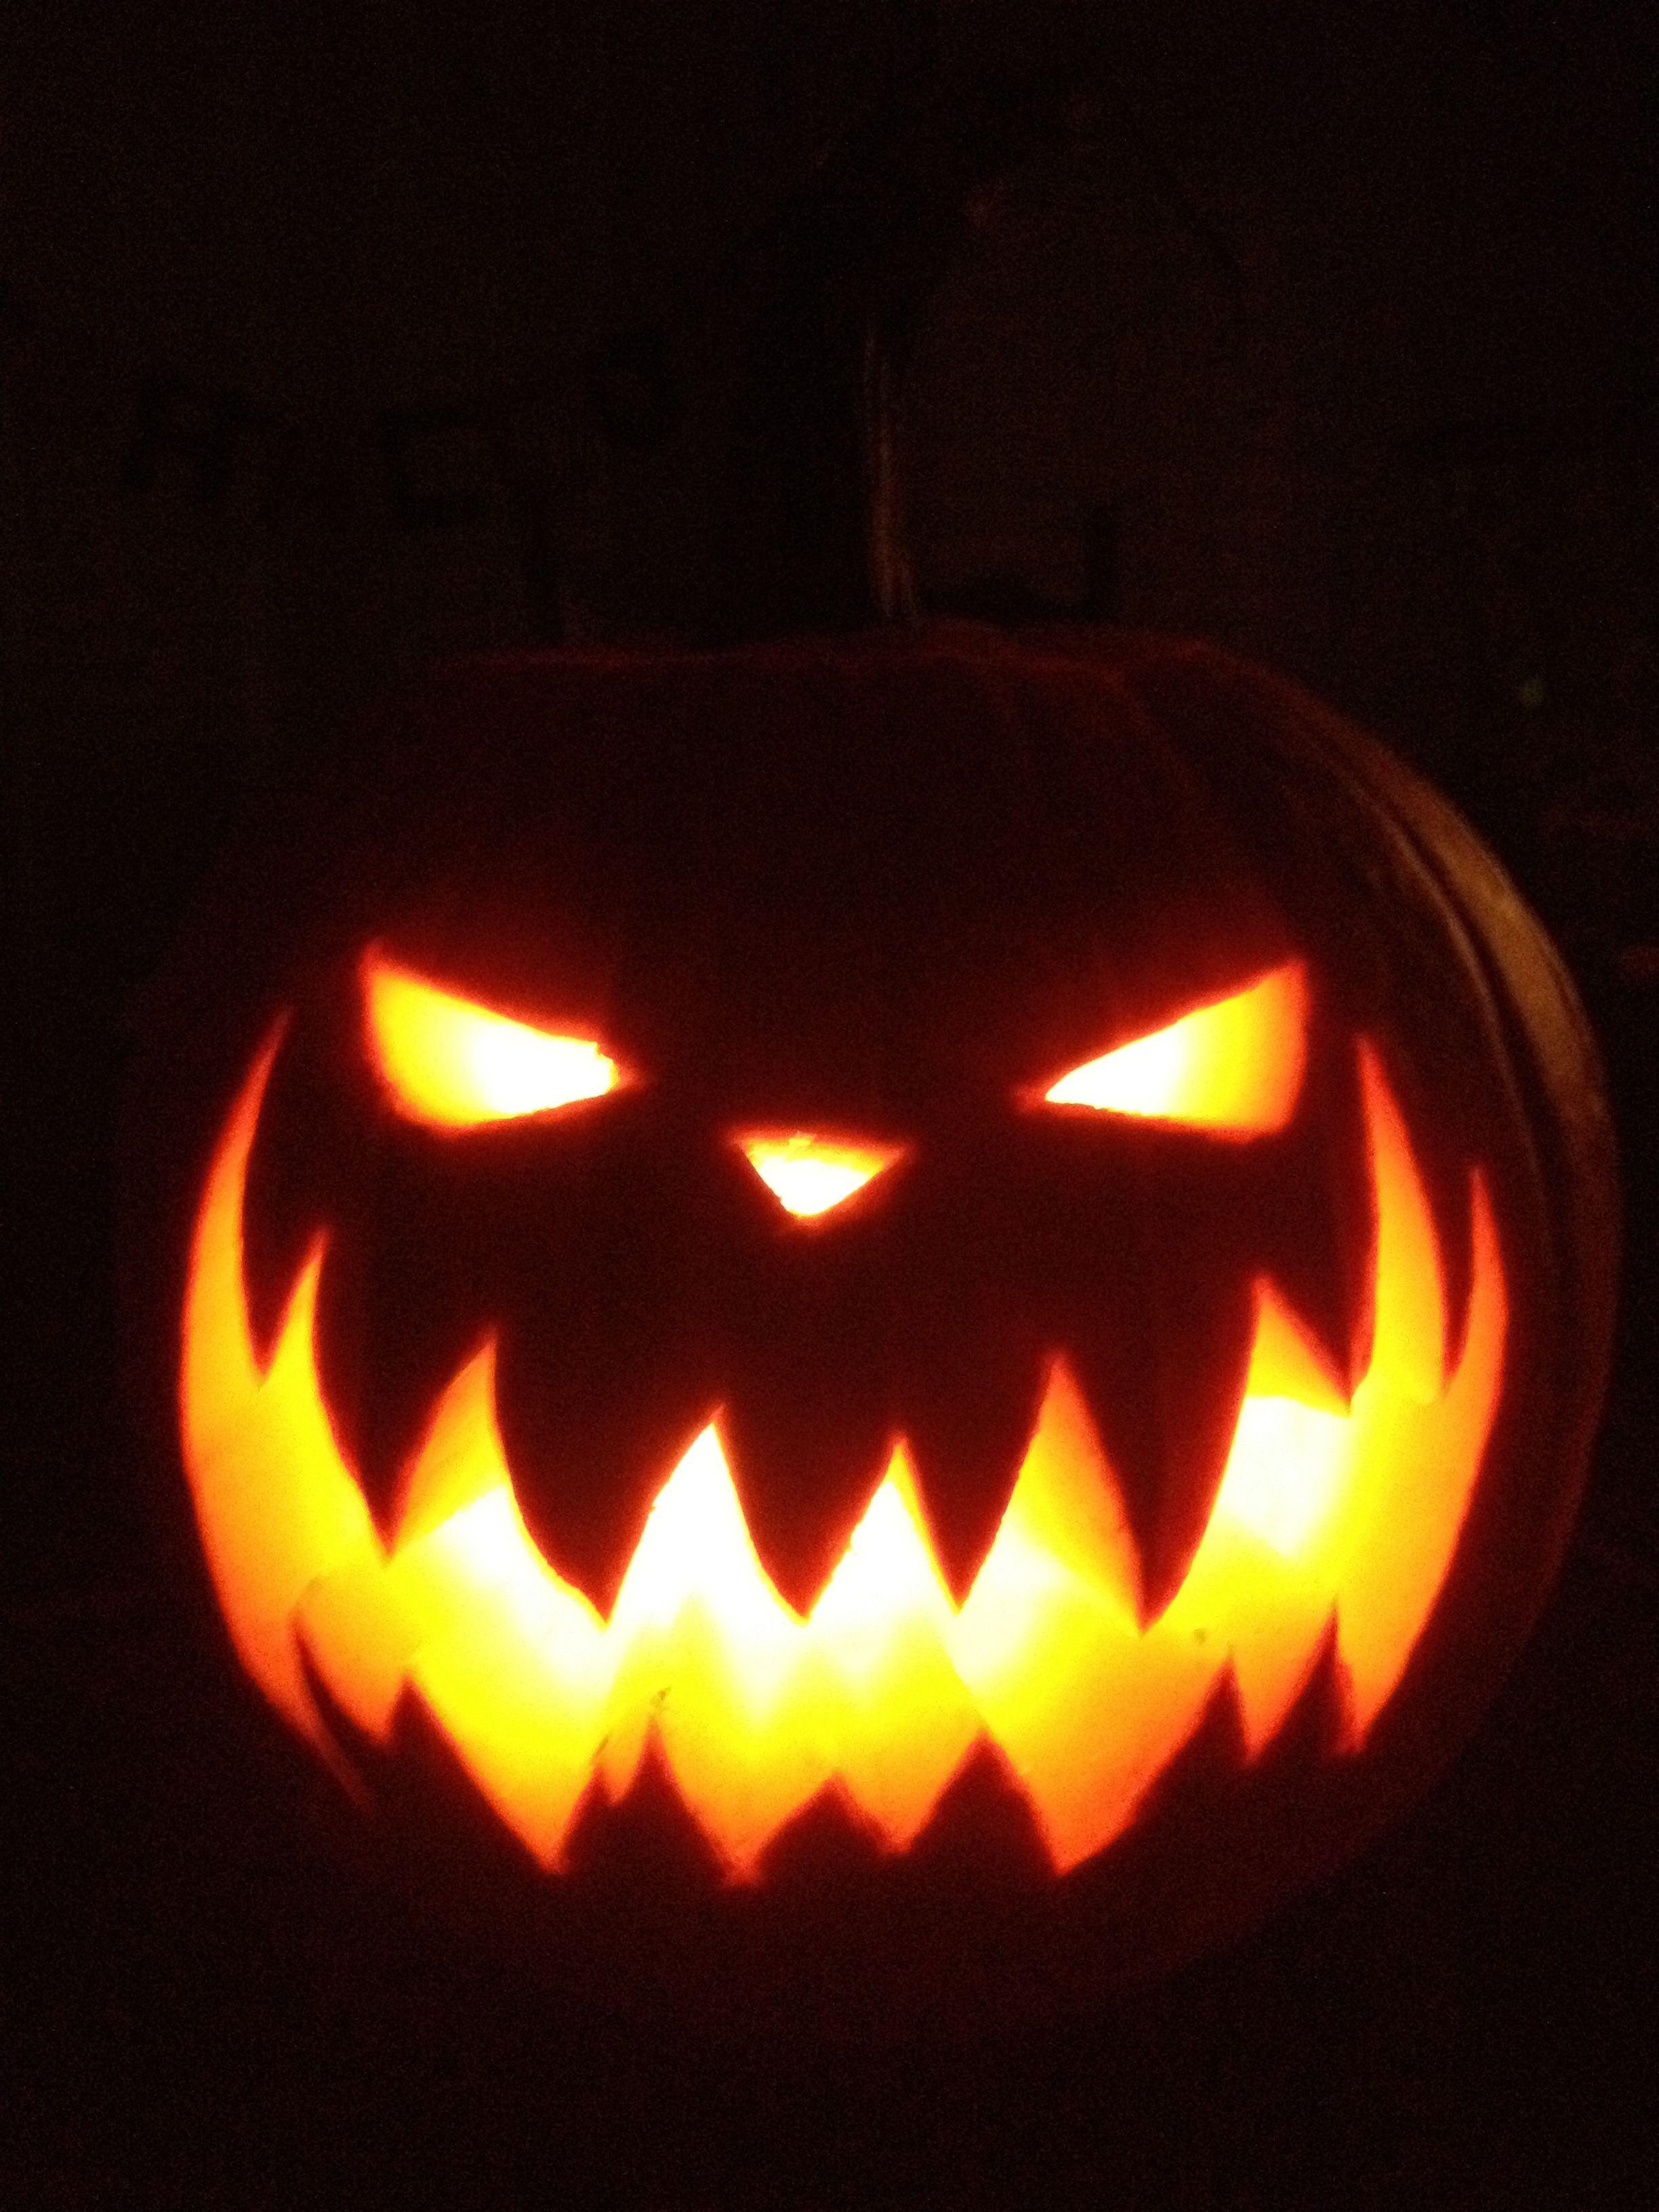 Pumpkin carving - Nightmare before Christmas Pumpkin King pumpkin ...